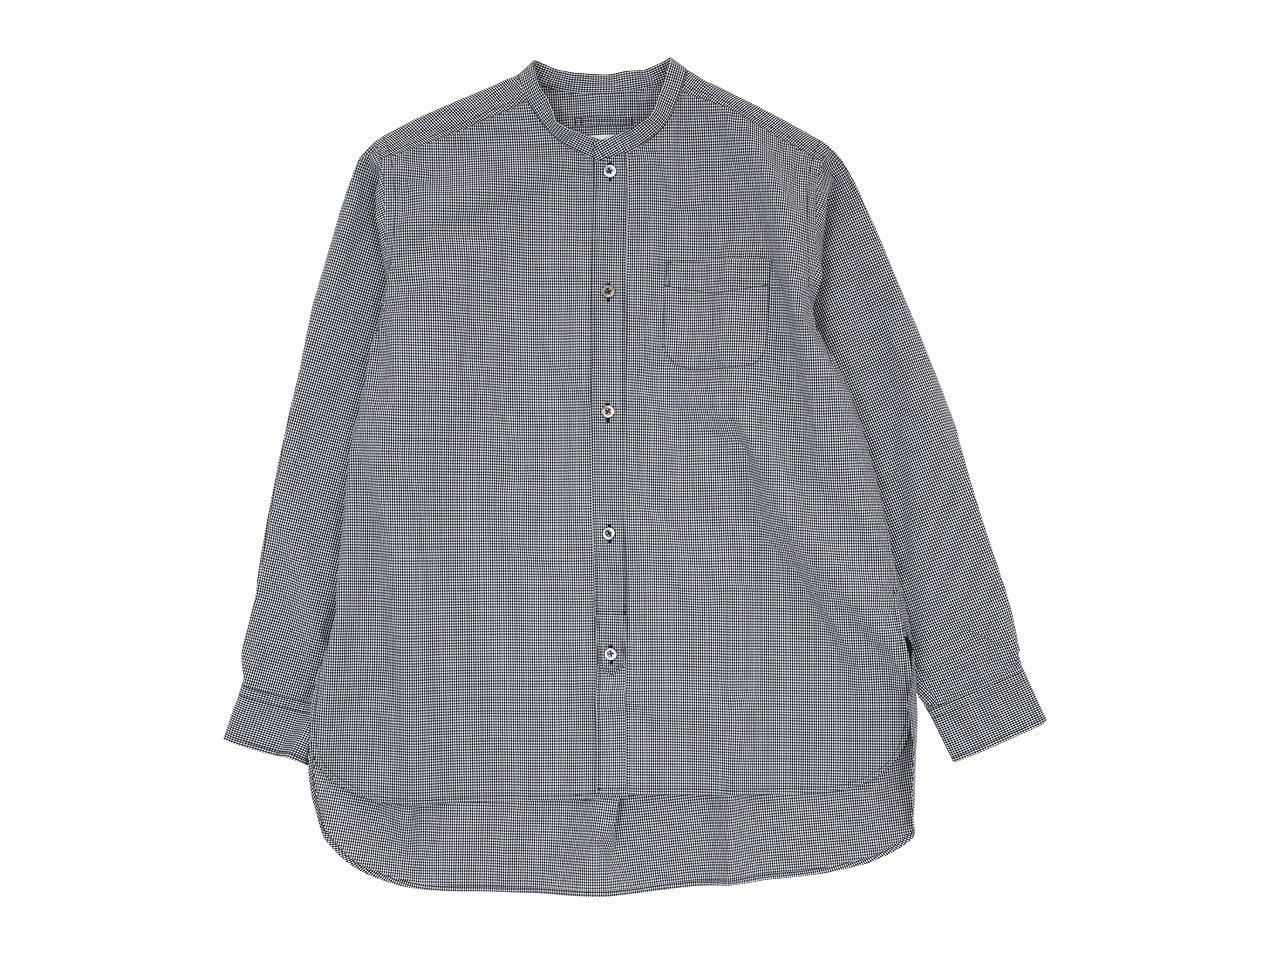 blanc no collar long shirts cotton MONOTONE GINGAM 〔メンズ〕